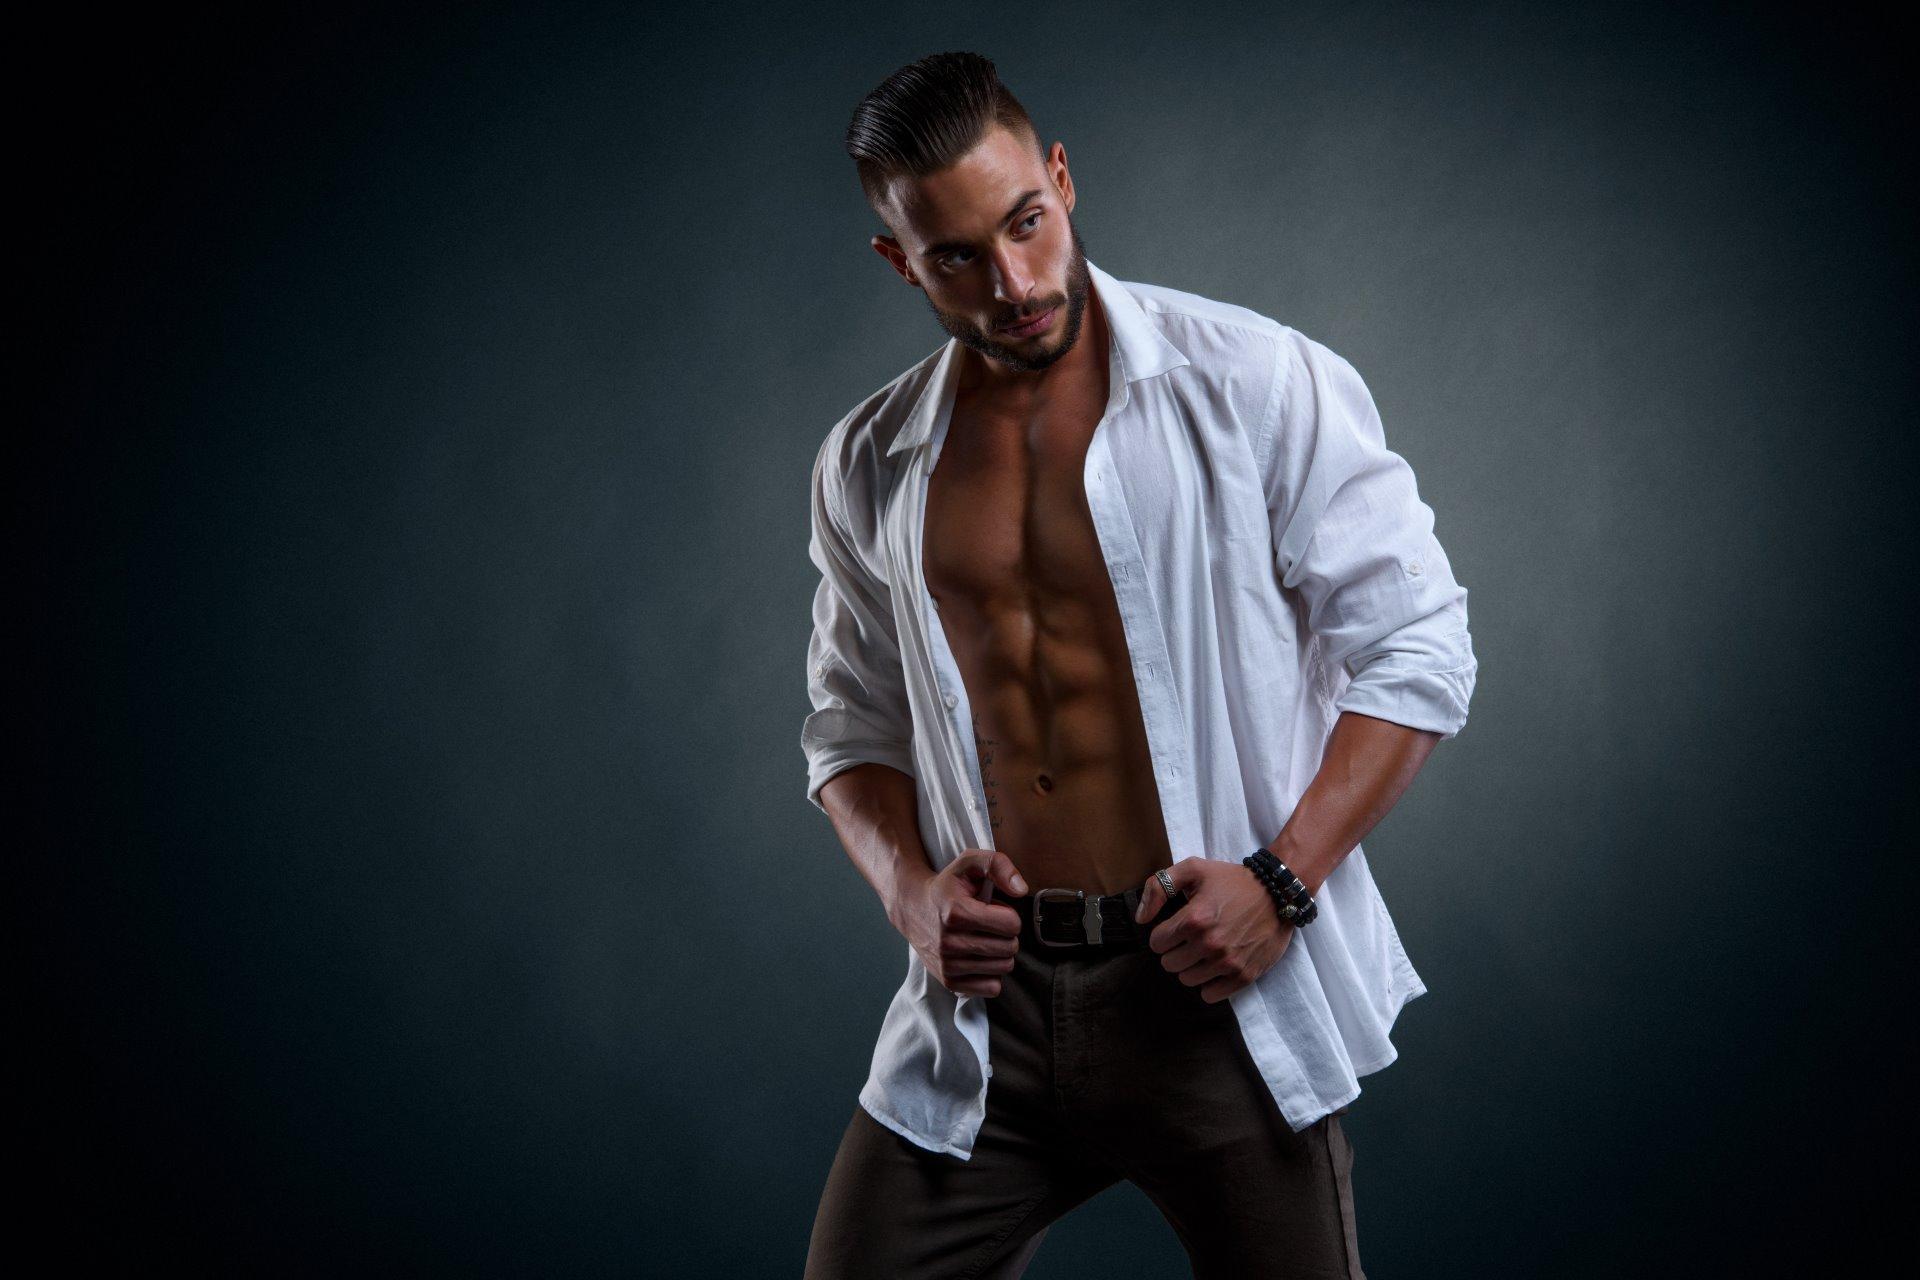 Model Mann, Fitness, Coaching und Personaltrainer Berlin, Ernährungscoach